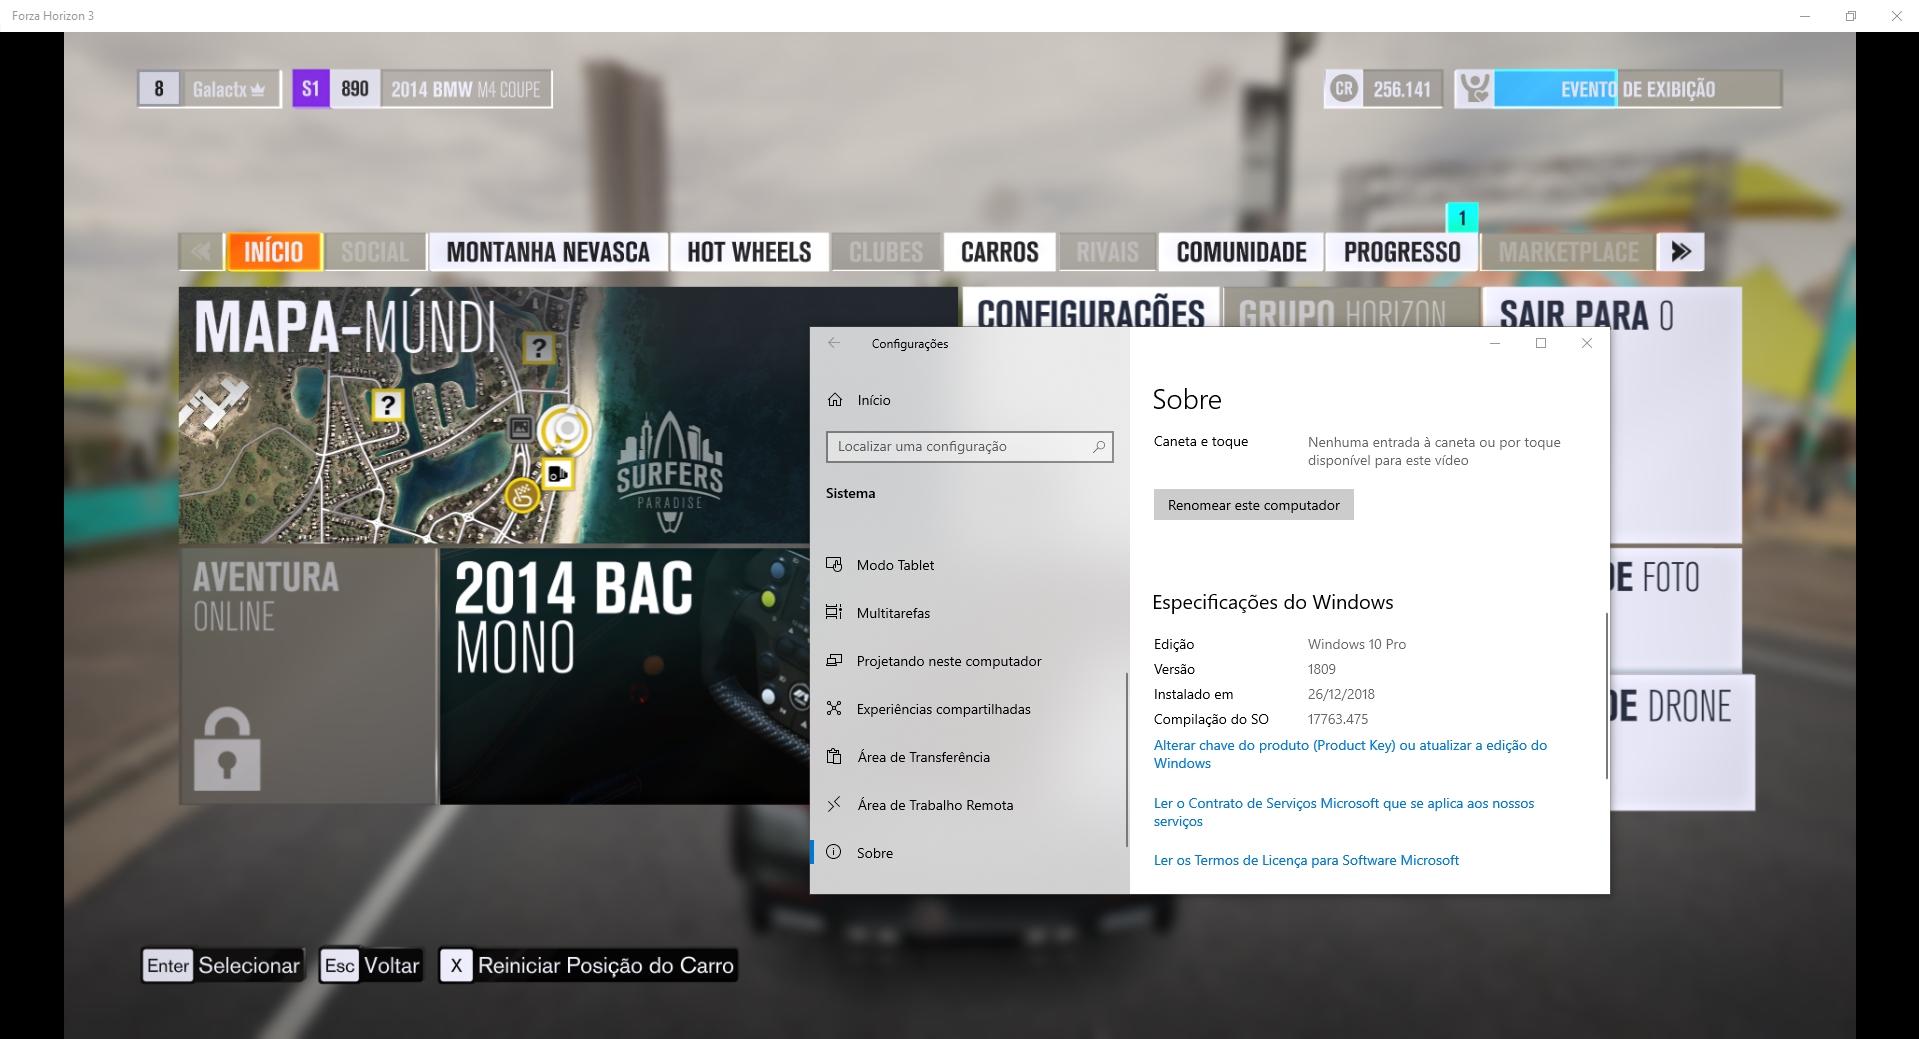 Forza Horizon 3 Crack Status | CrackWatch